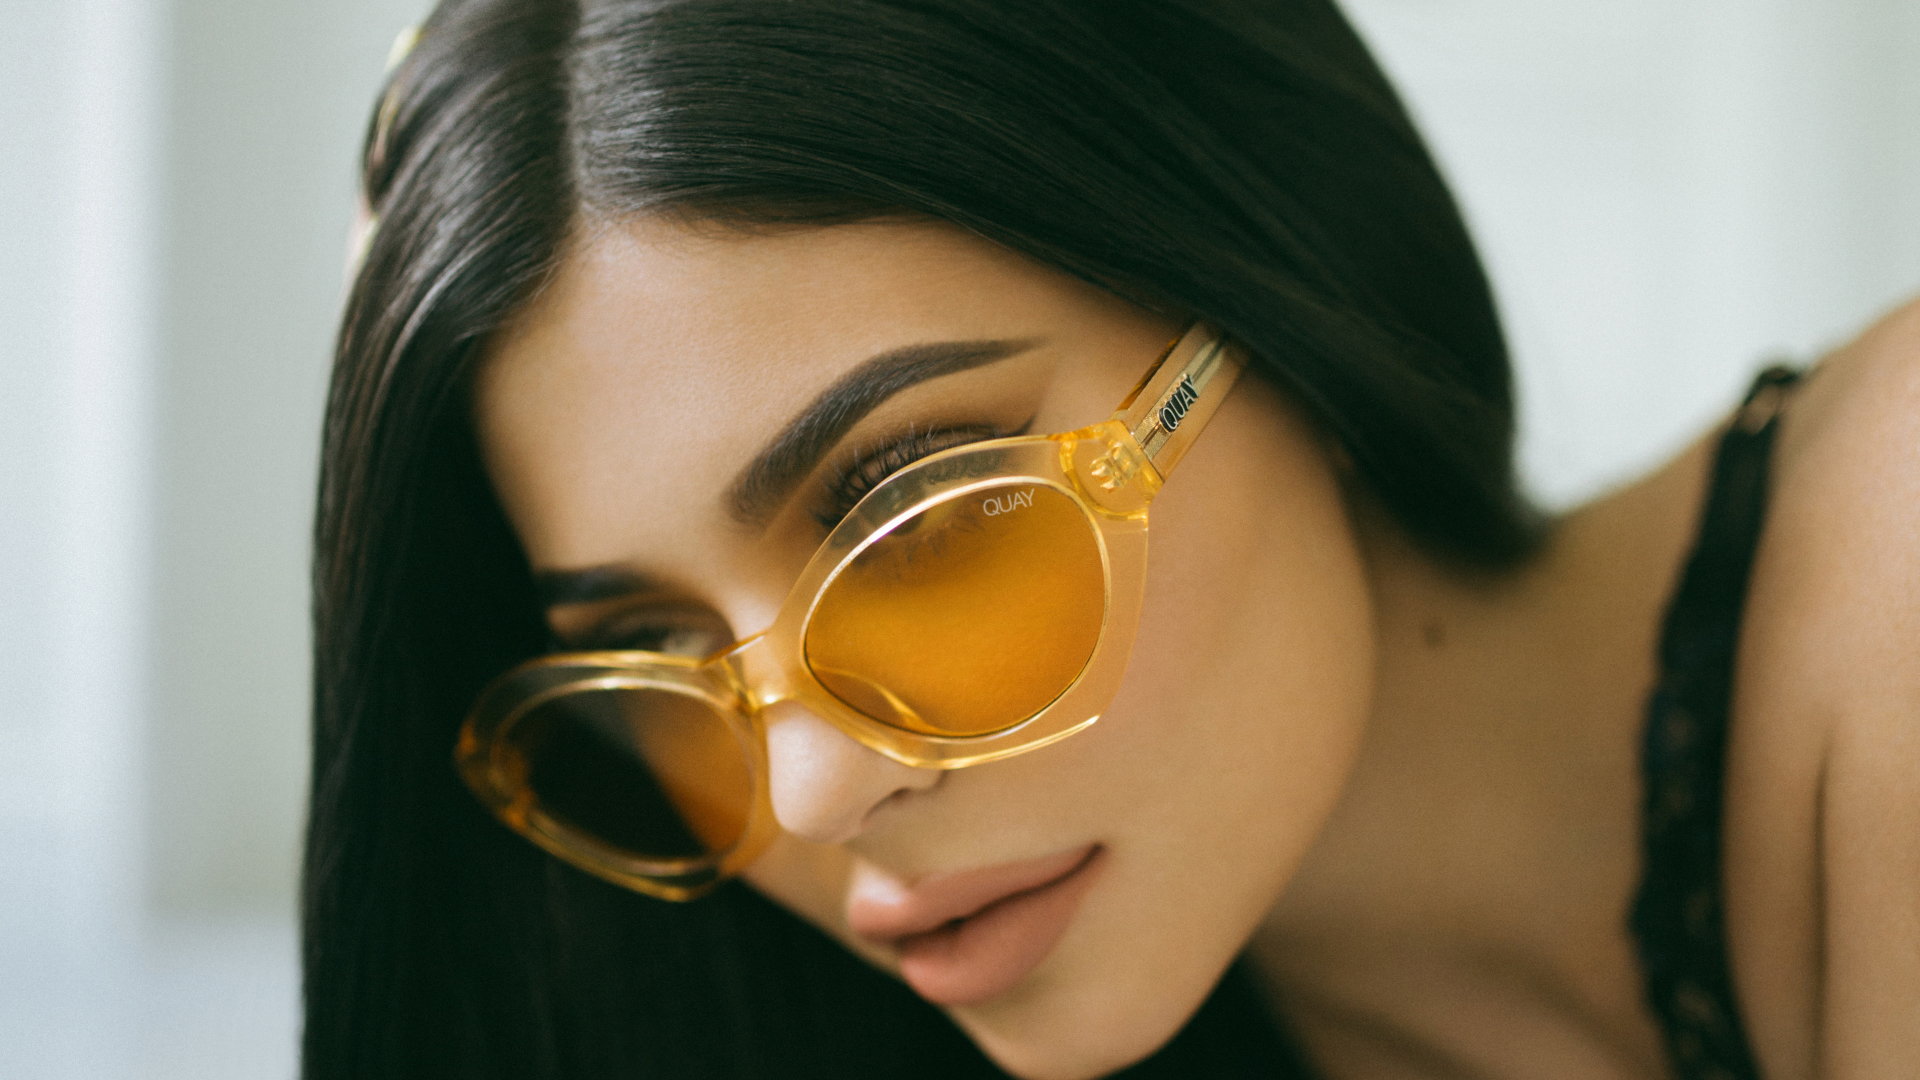 Kylie Jenner 2017 Hd Wallpapers: Kylie K Jenner Quay 2017, HD 4K Wallpaper